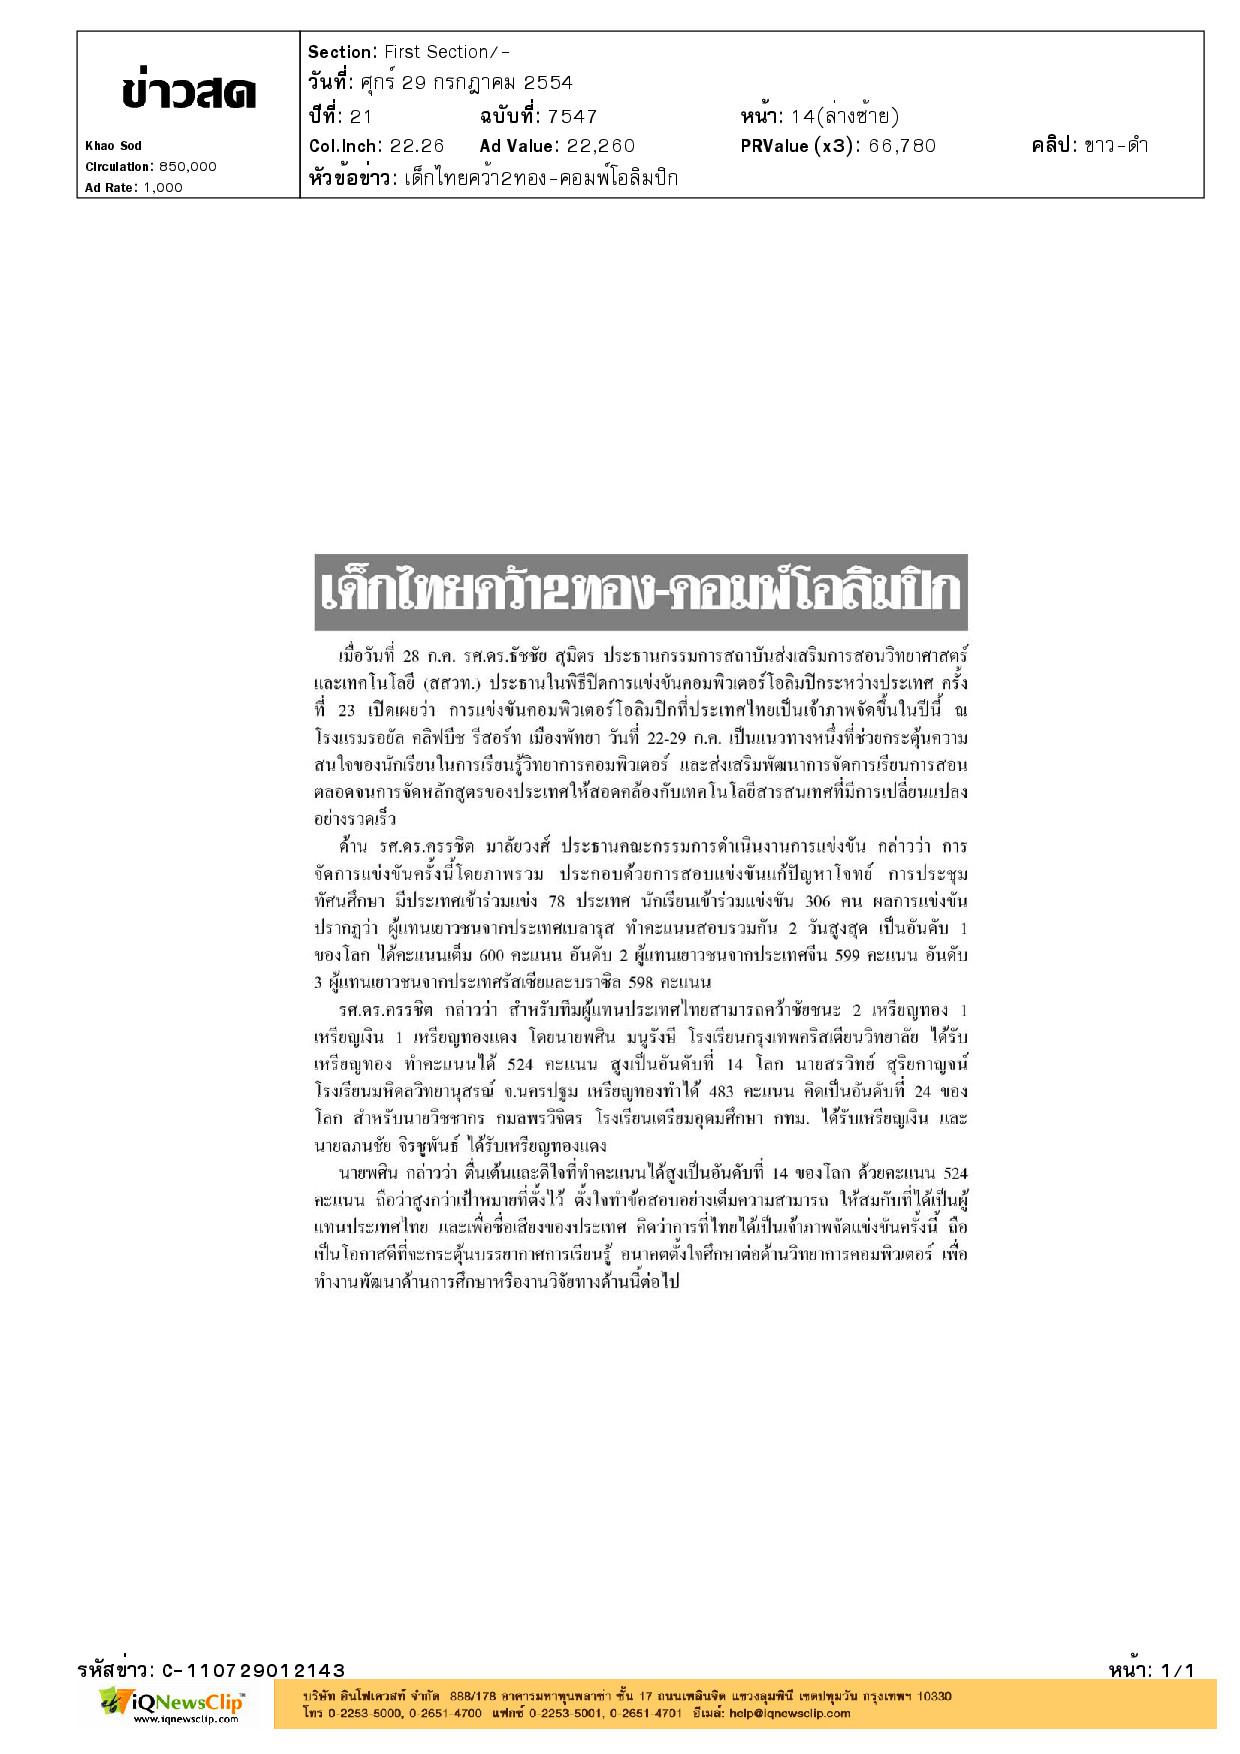 C-110729012143.pdf